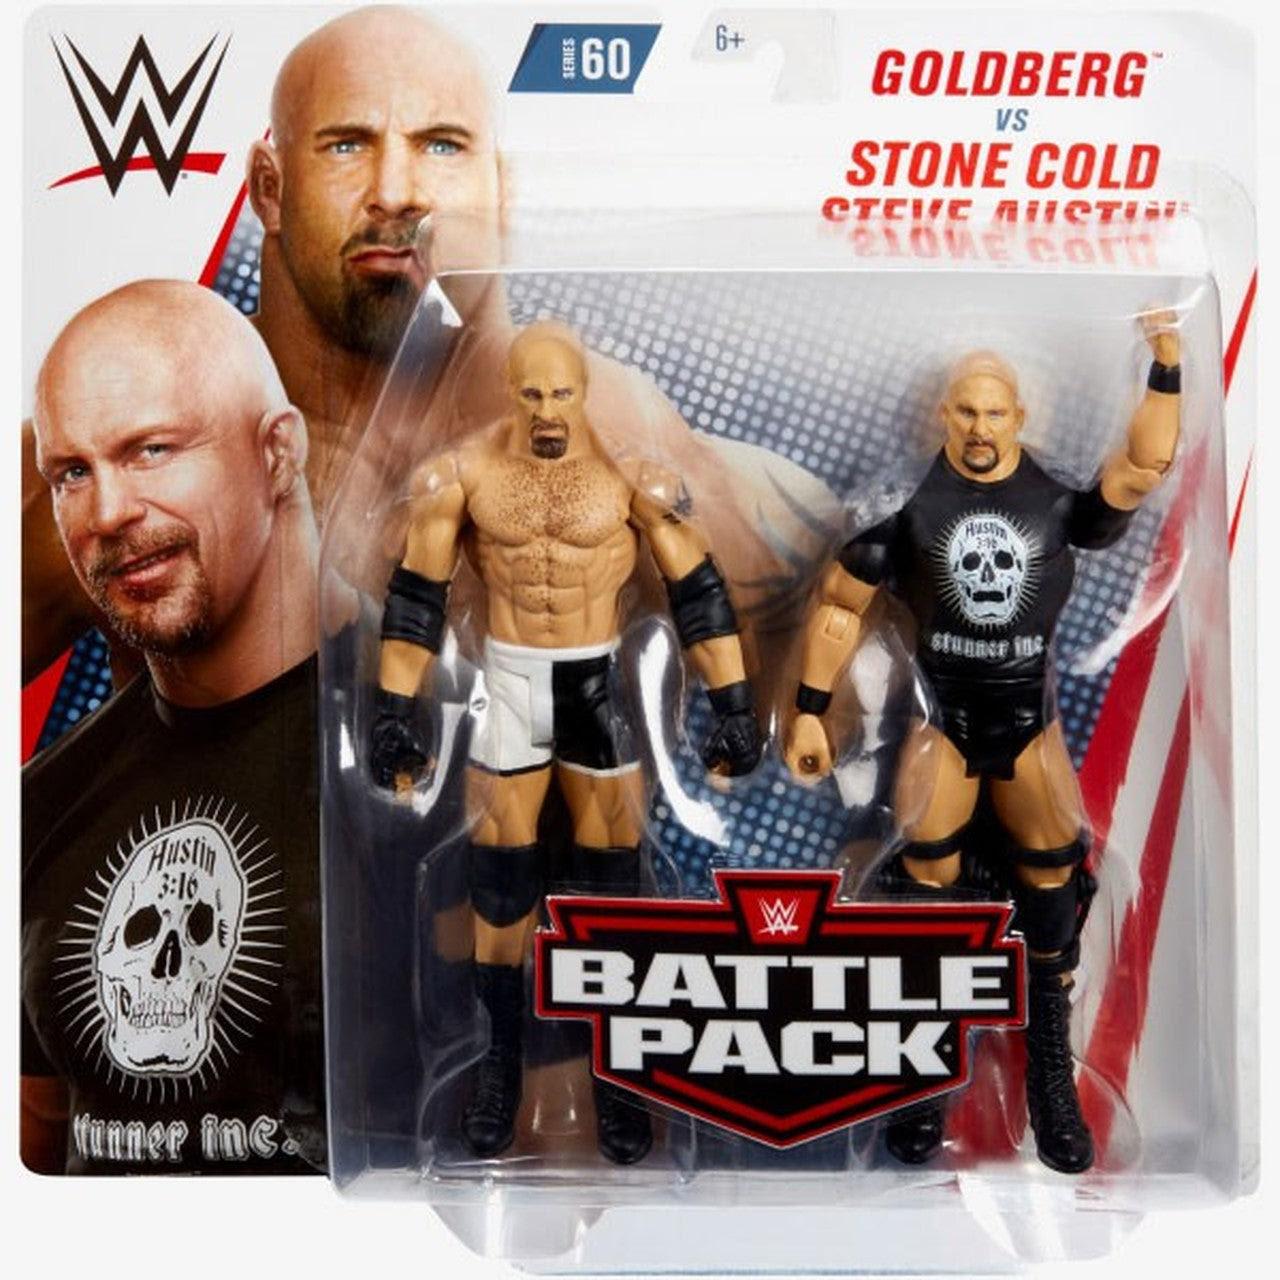 Image of WWE Battle Packs Series 60 - Goldberg & Stone Cold Steve Austin